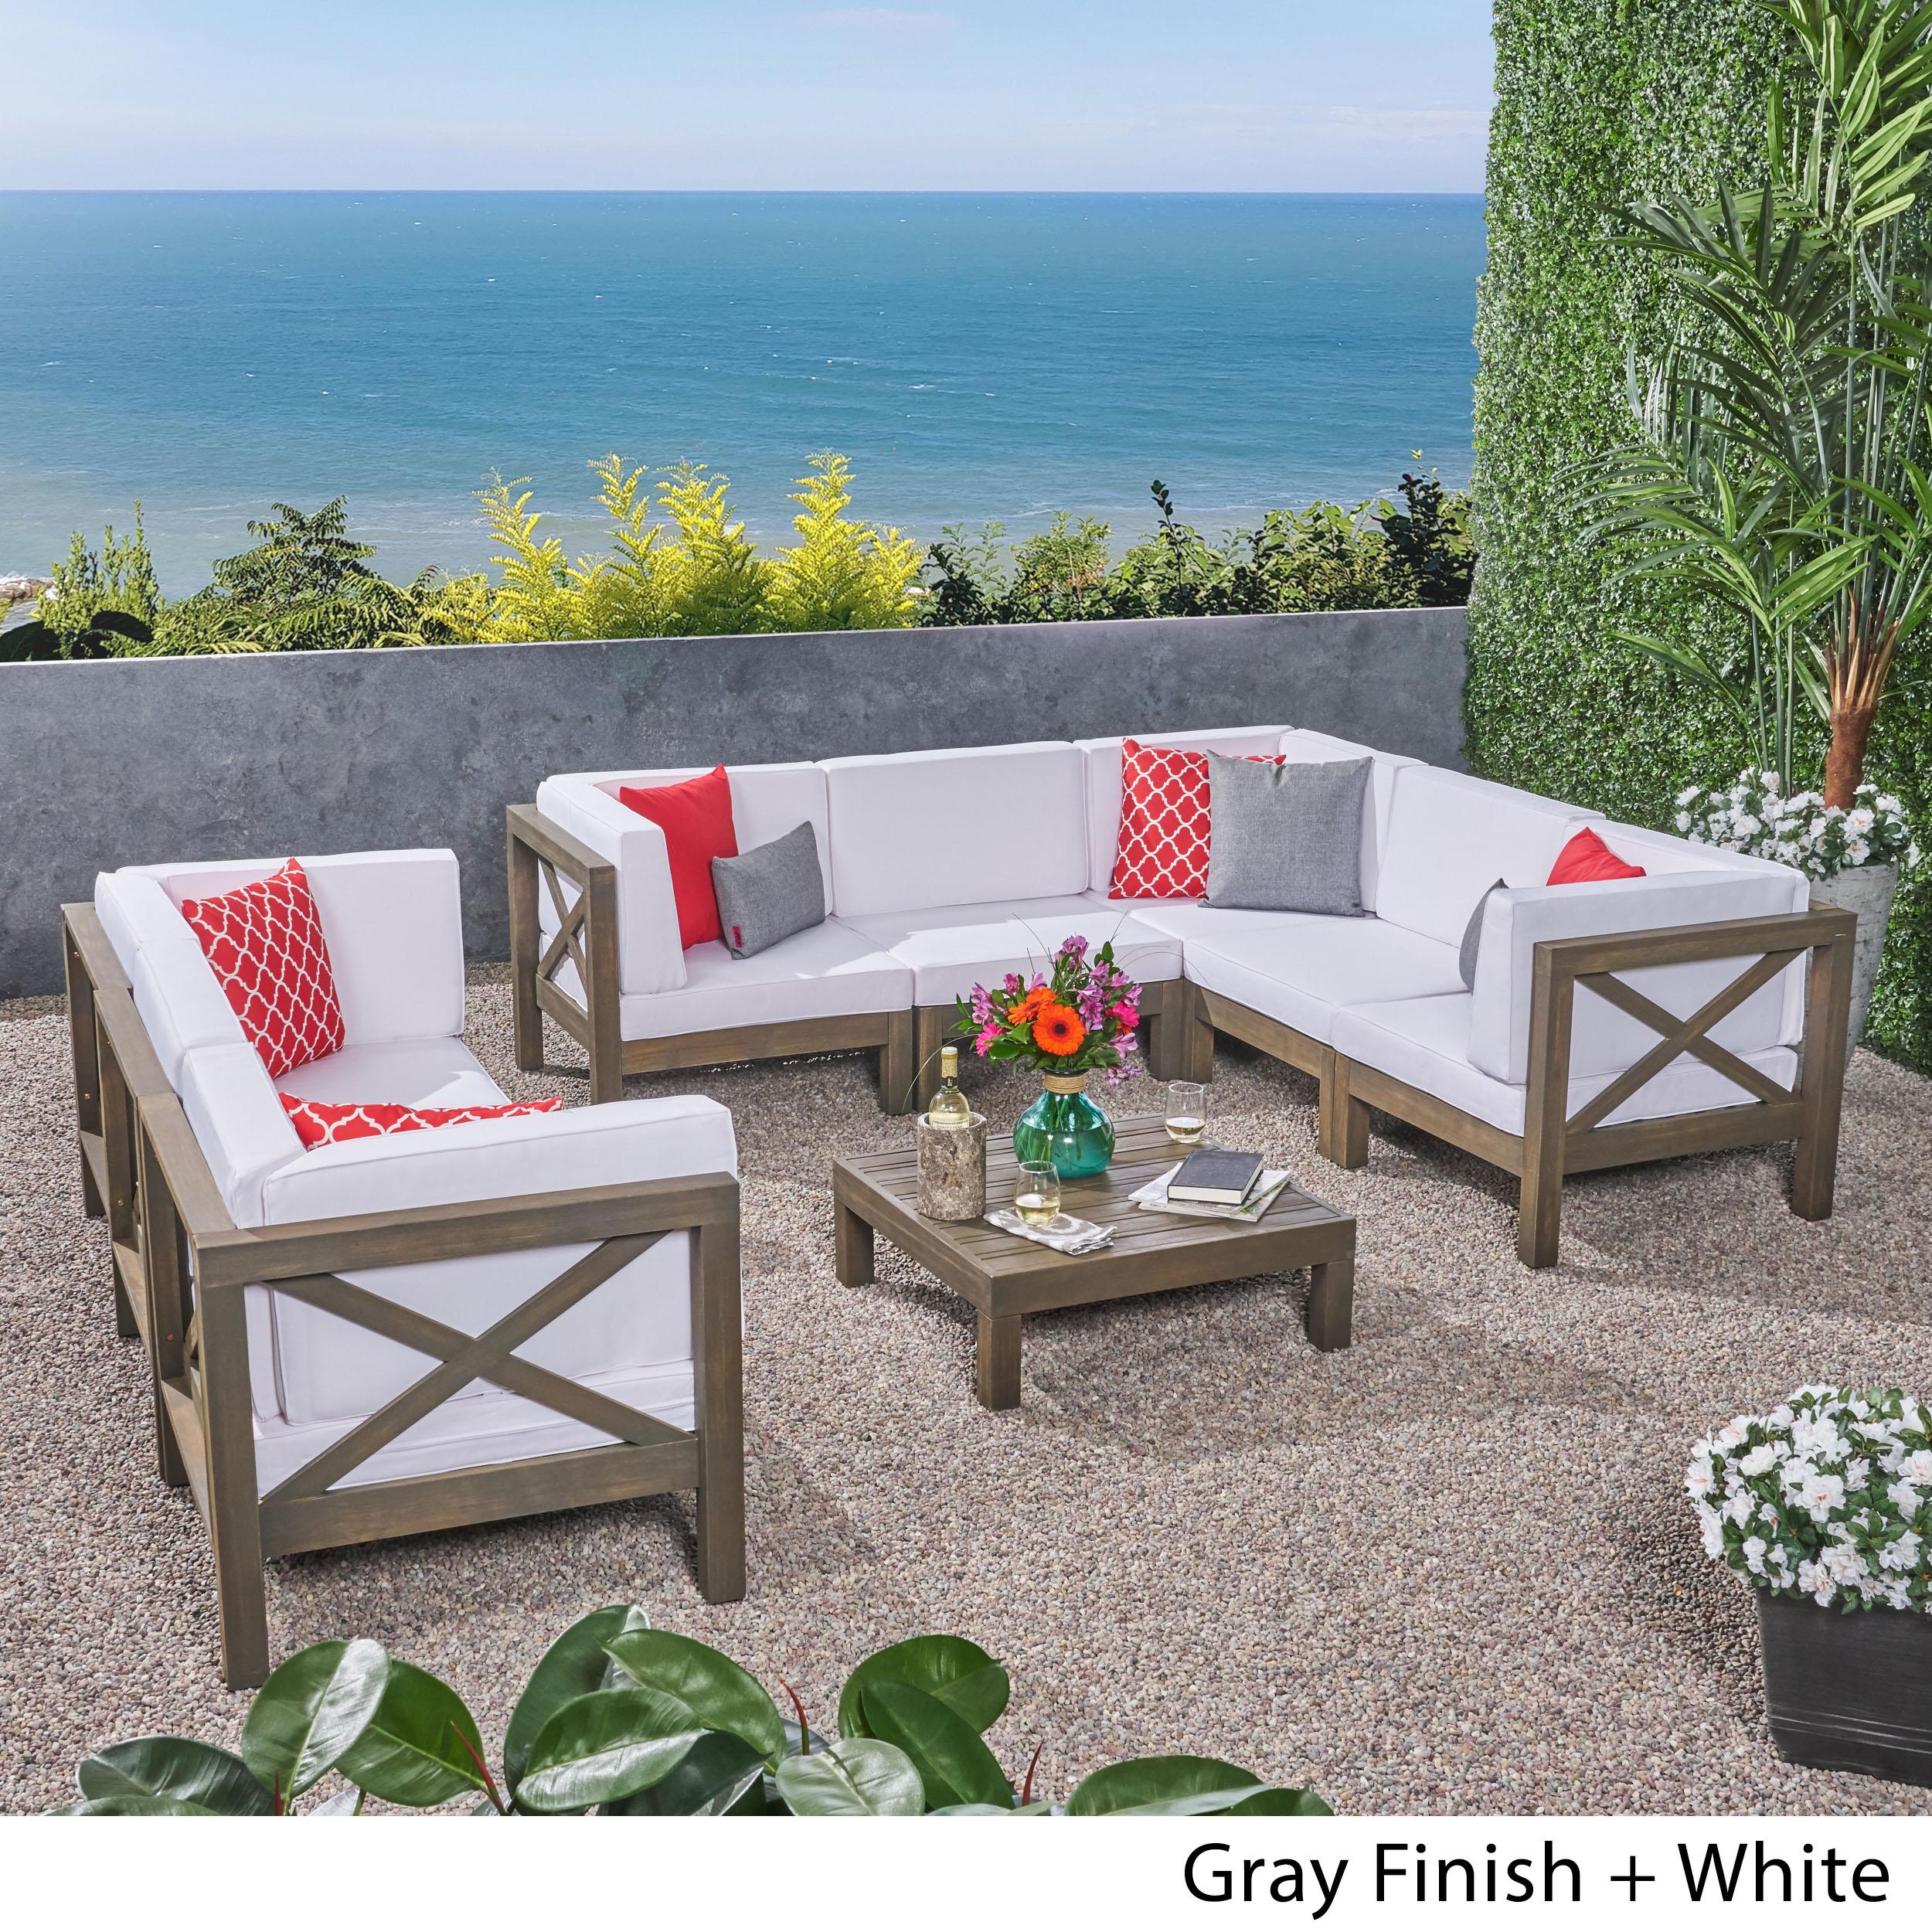 Elisha Outdoor 9 Piece Acacia Wood Sectional Sofa Set and Coffee Table with Cushions, Teak, Blue